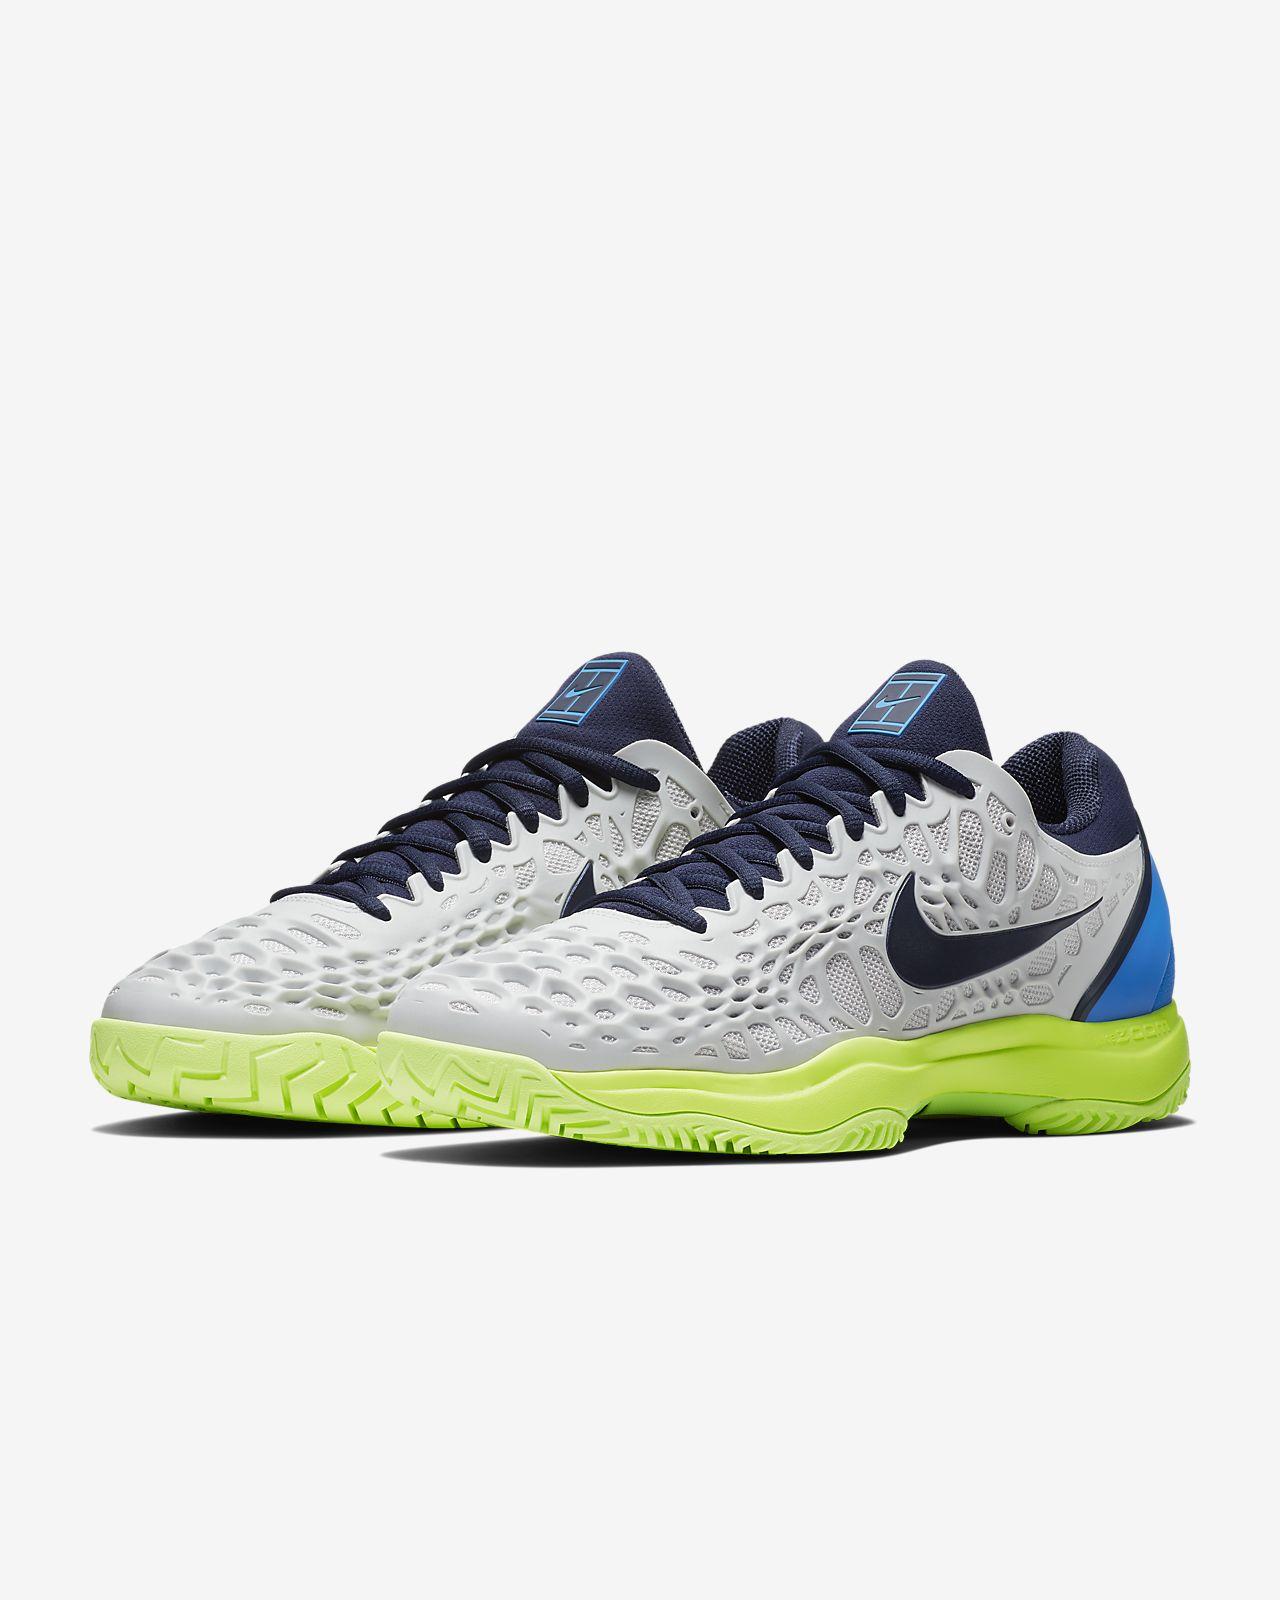 ed34628fd4aa NikeCourt Zoom Cage 3 Men s Hard Court Tennis Shoe. Nike.com GB